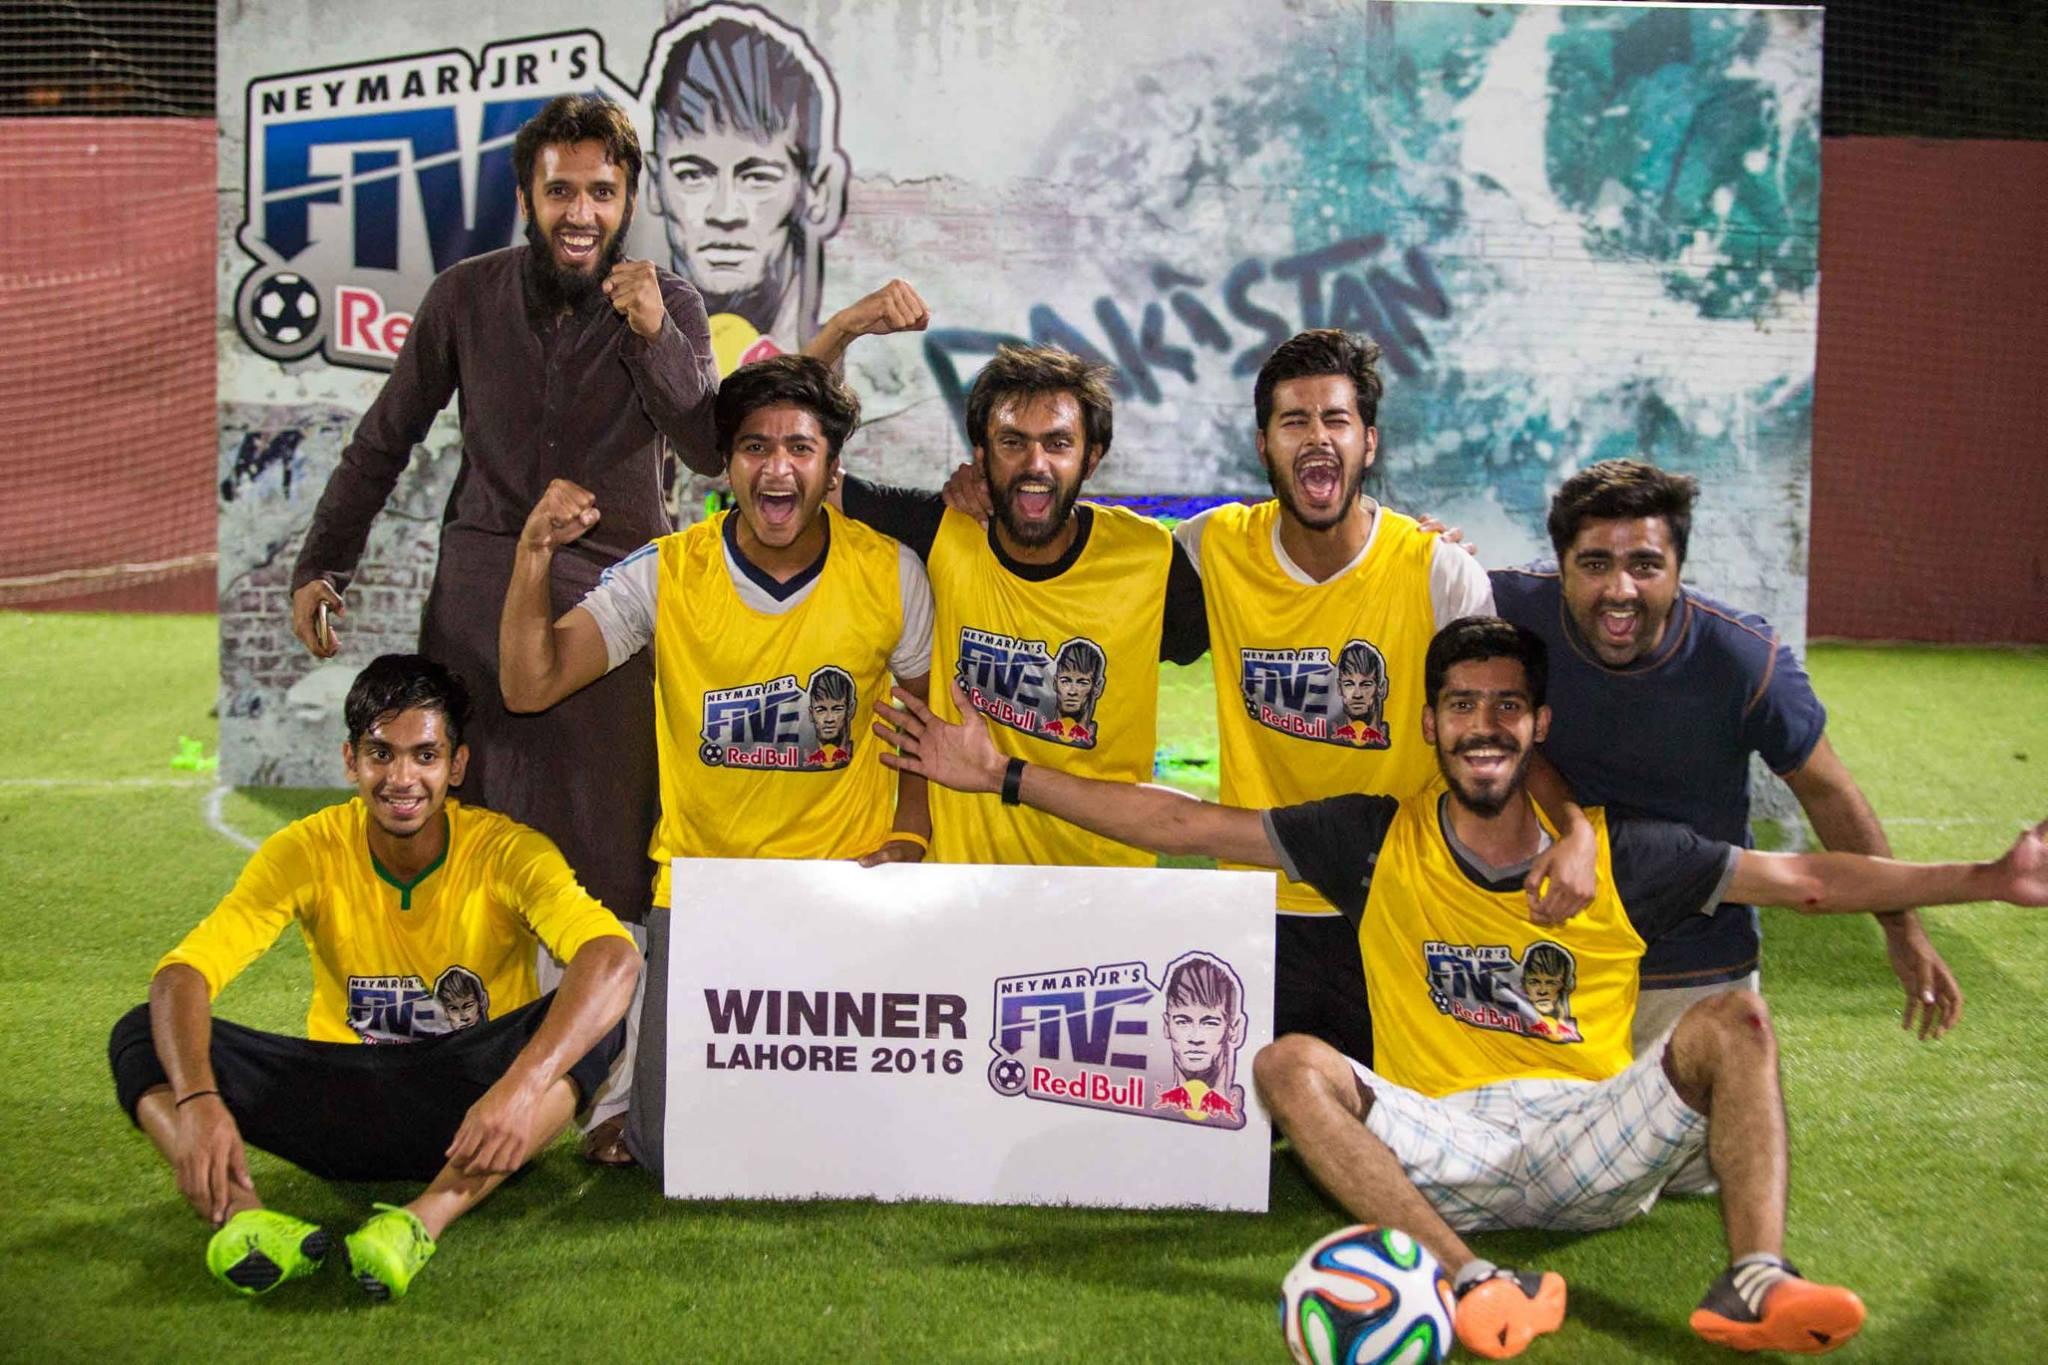 Fantastic Five win Lahore leg of Neymar Jr's Five qualifiers [Dawn]